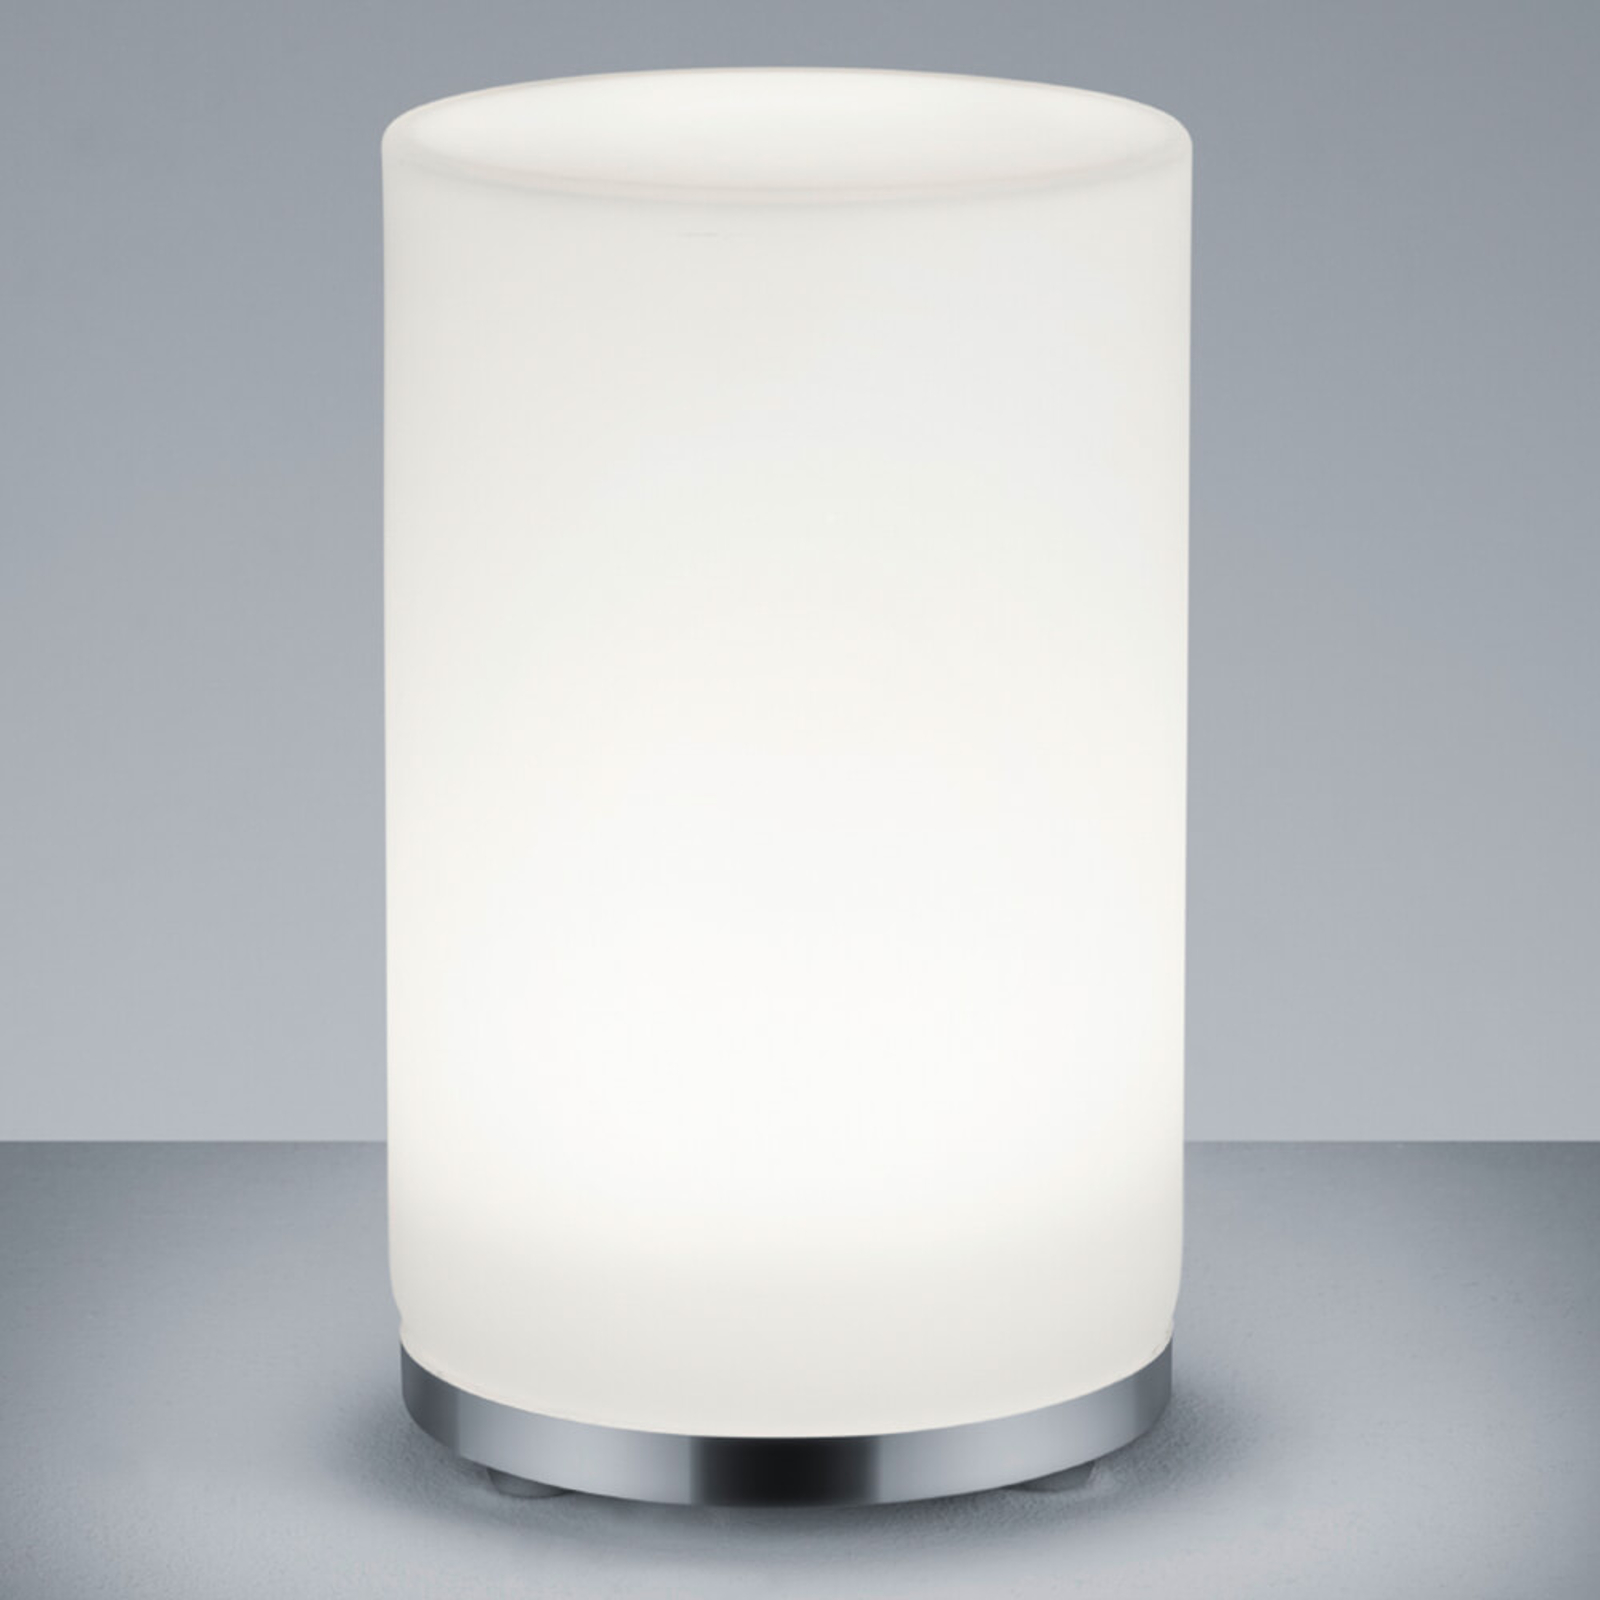 RGBW-LED-bordlampe John sylinderform fjernkontroll